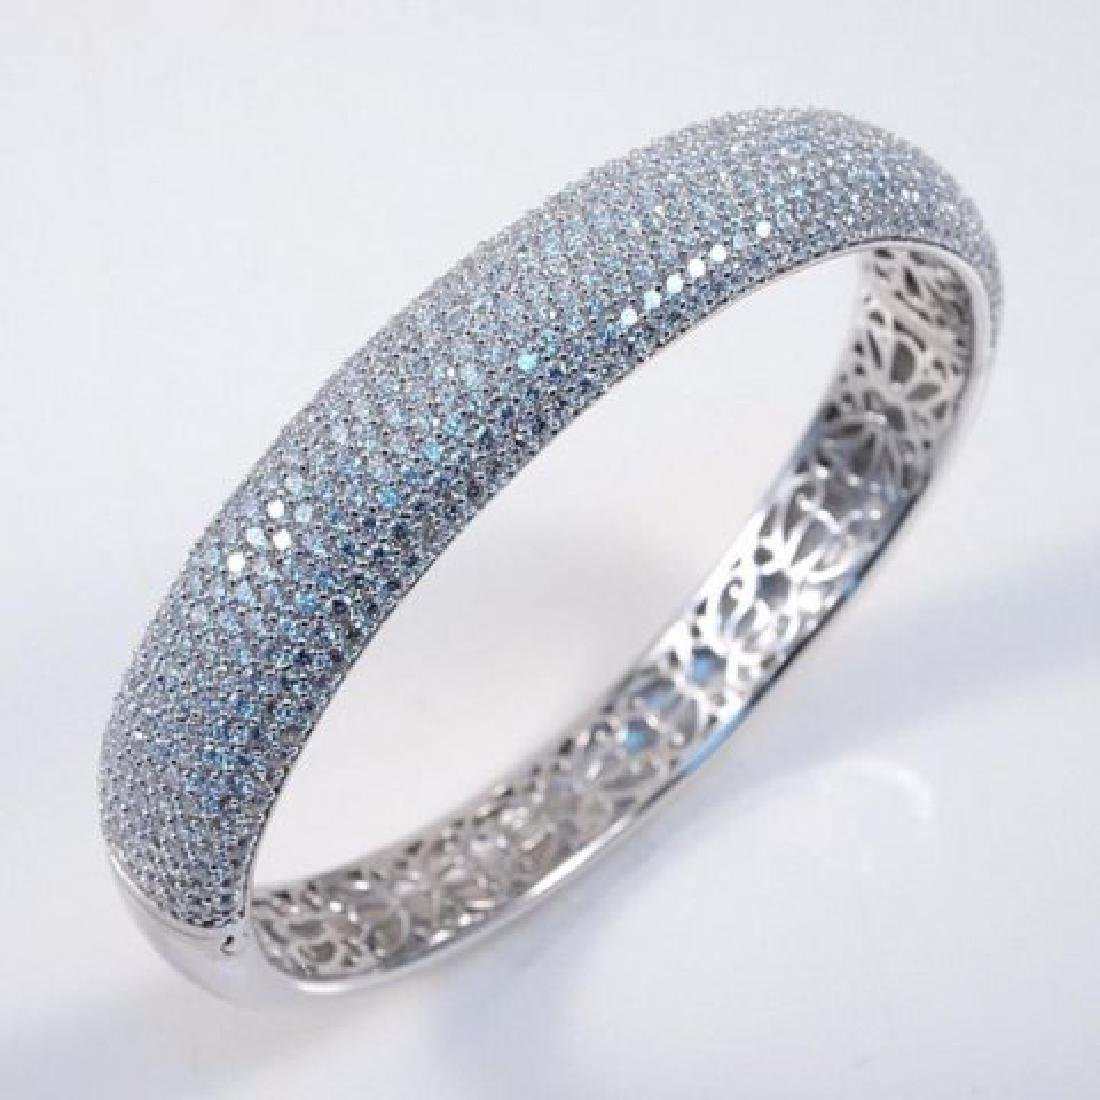 Creation Diamond Bangle 12.91Ct 18k W/g Overlay